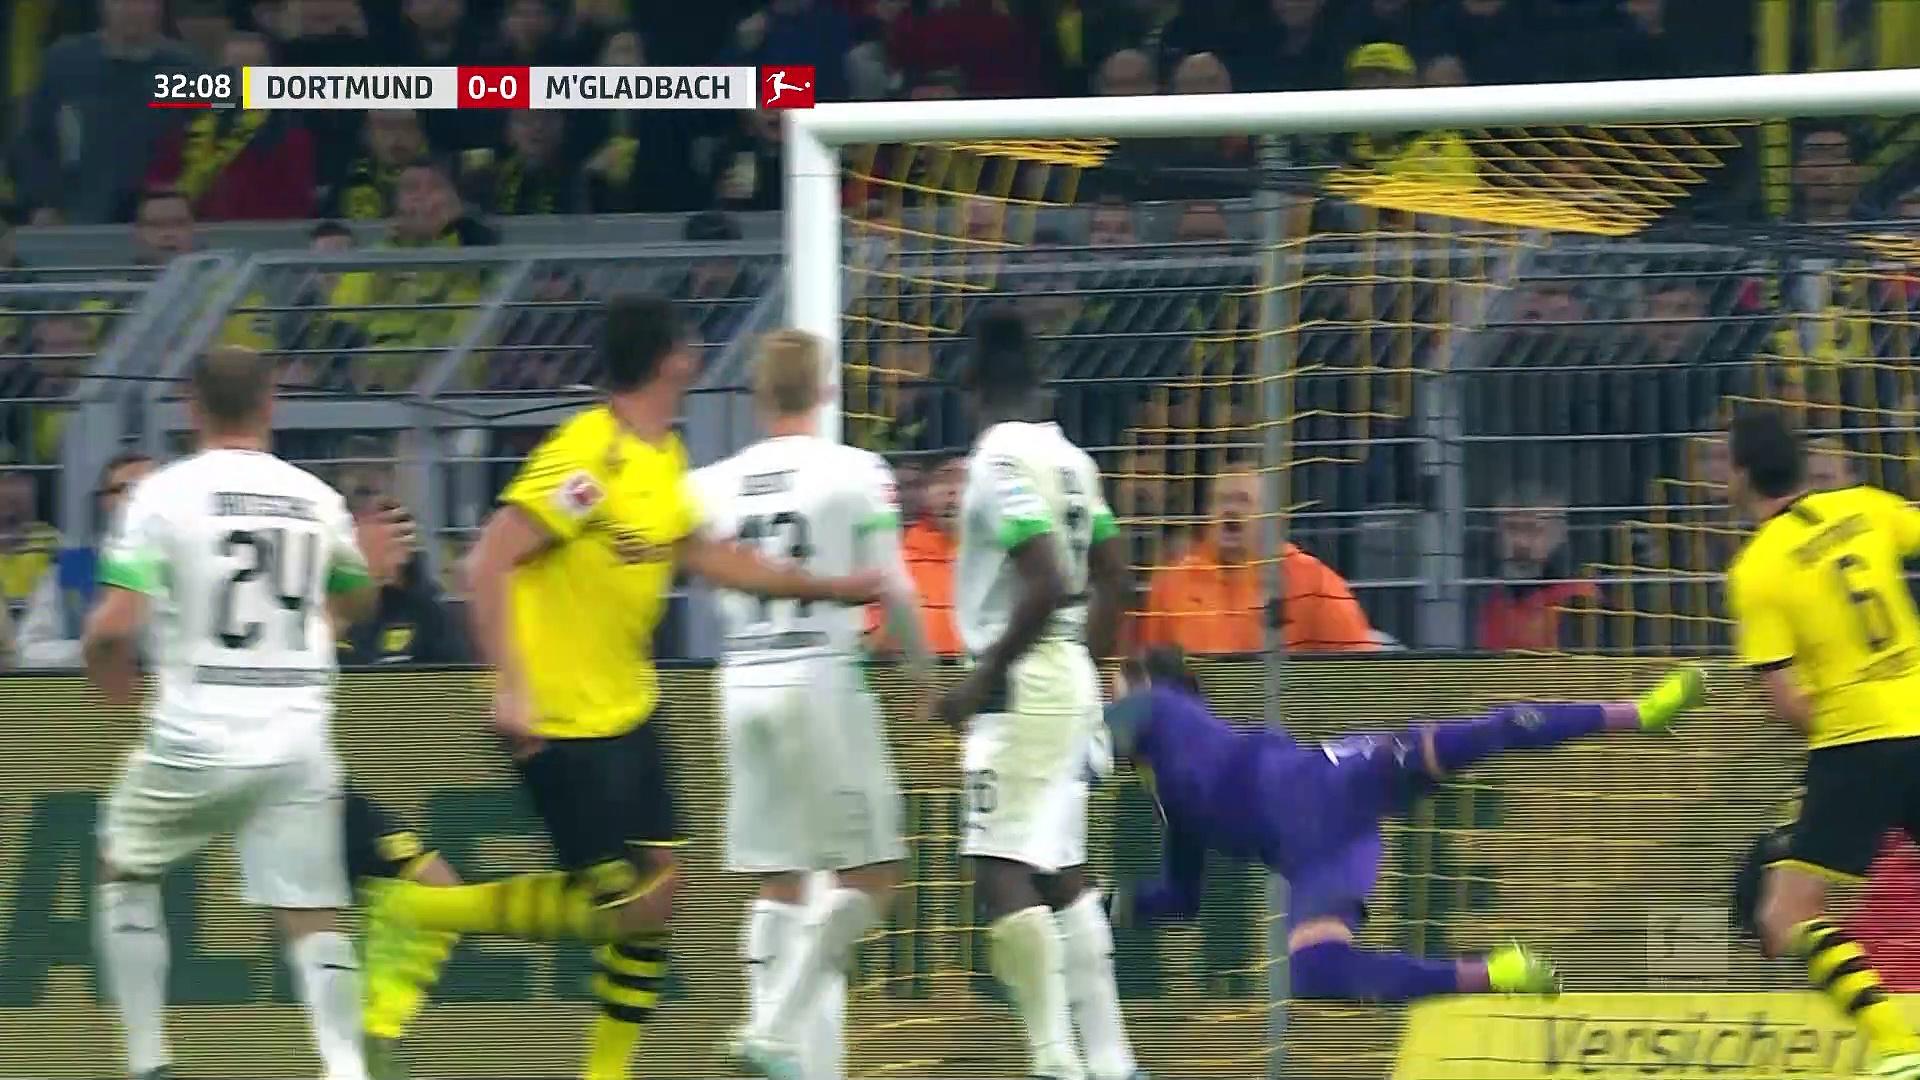 8. Hafta / Borussia Dortmund - Borussia Mönchengladbach: 1-0 (Özet)